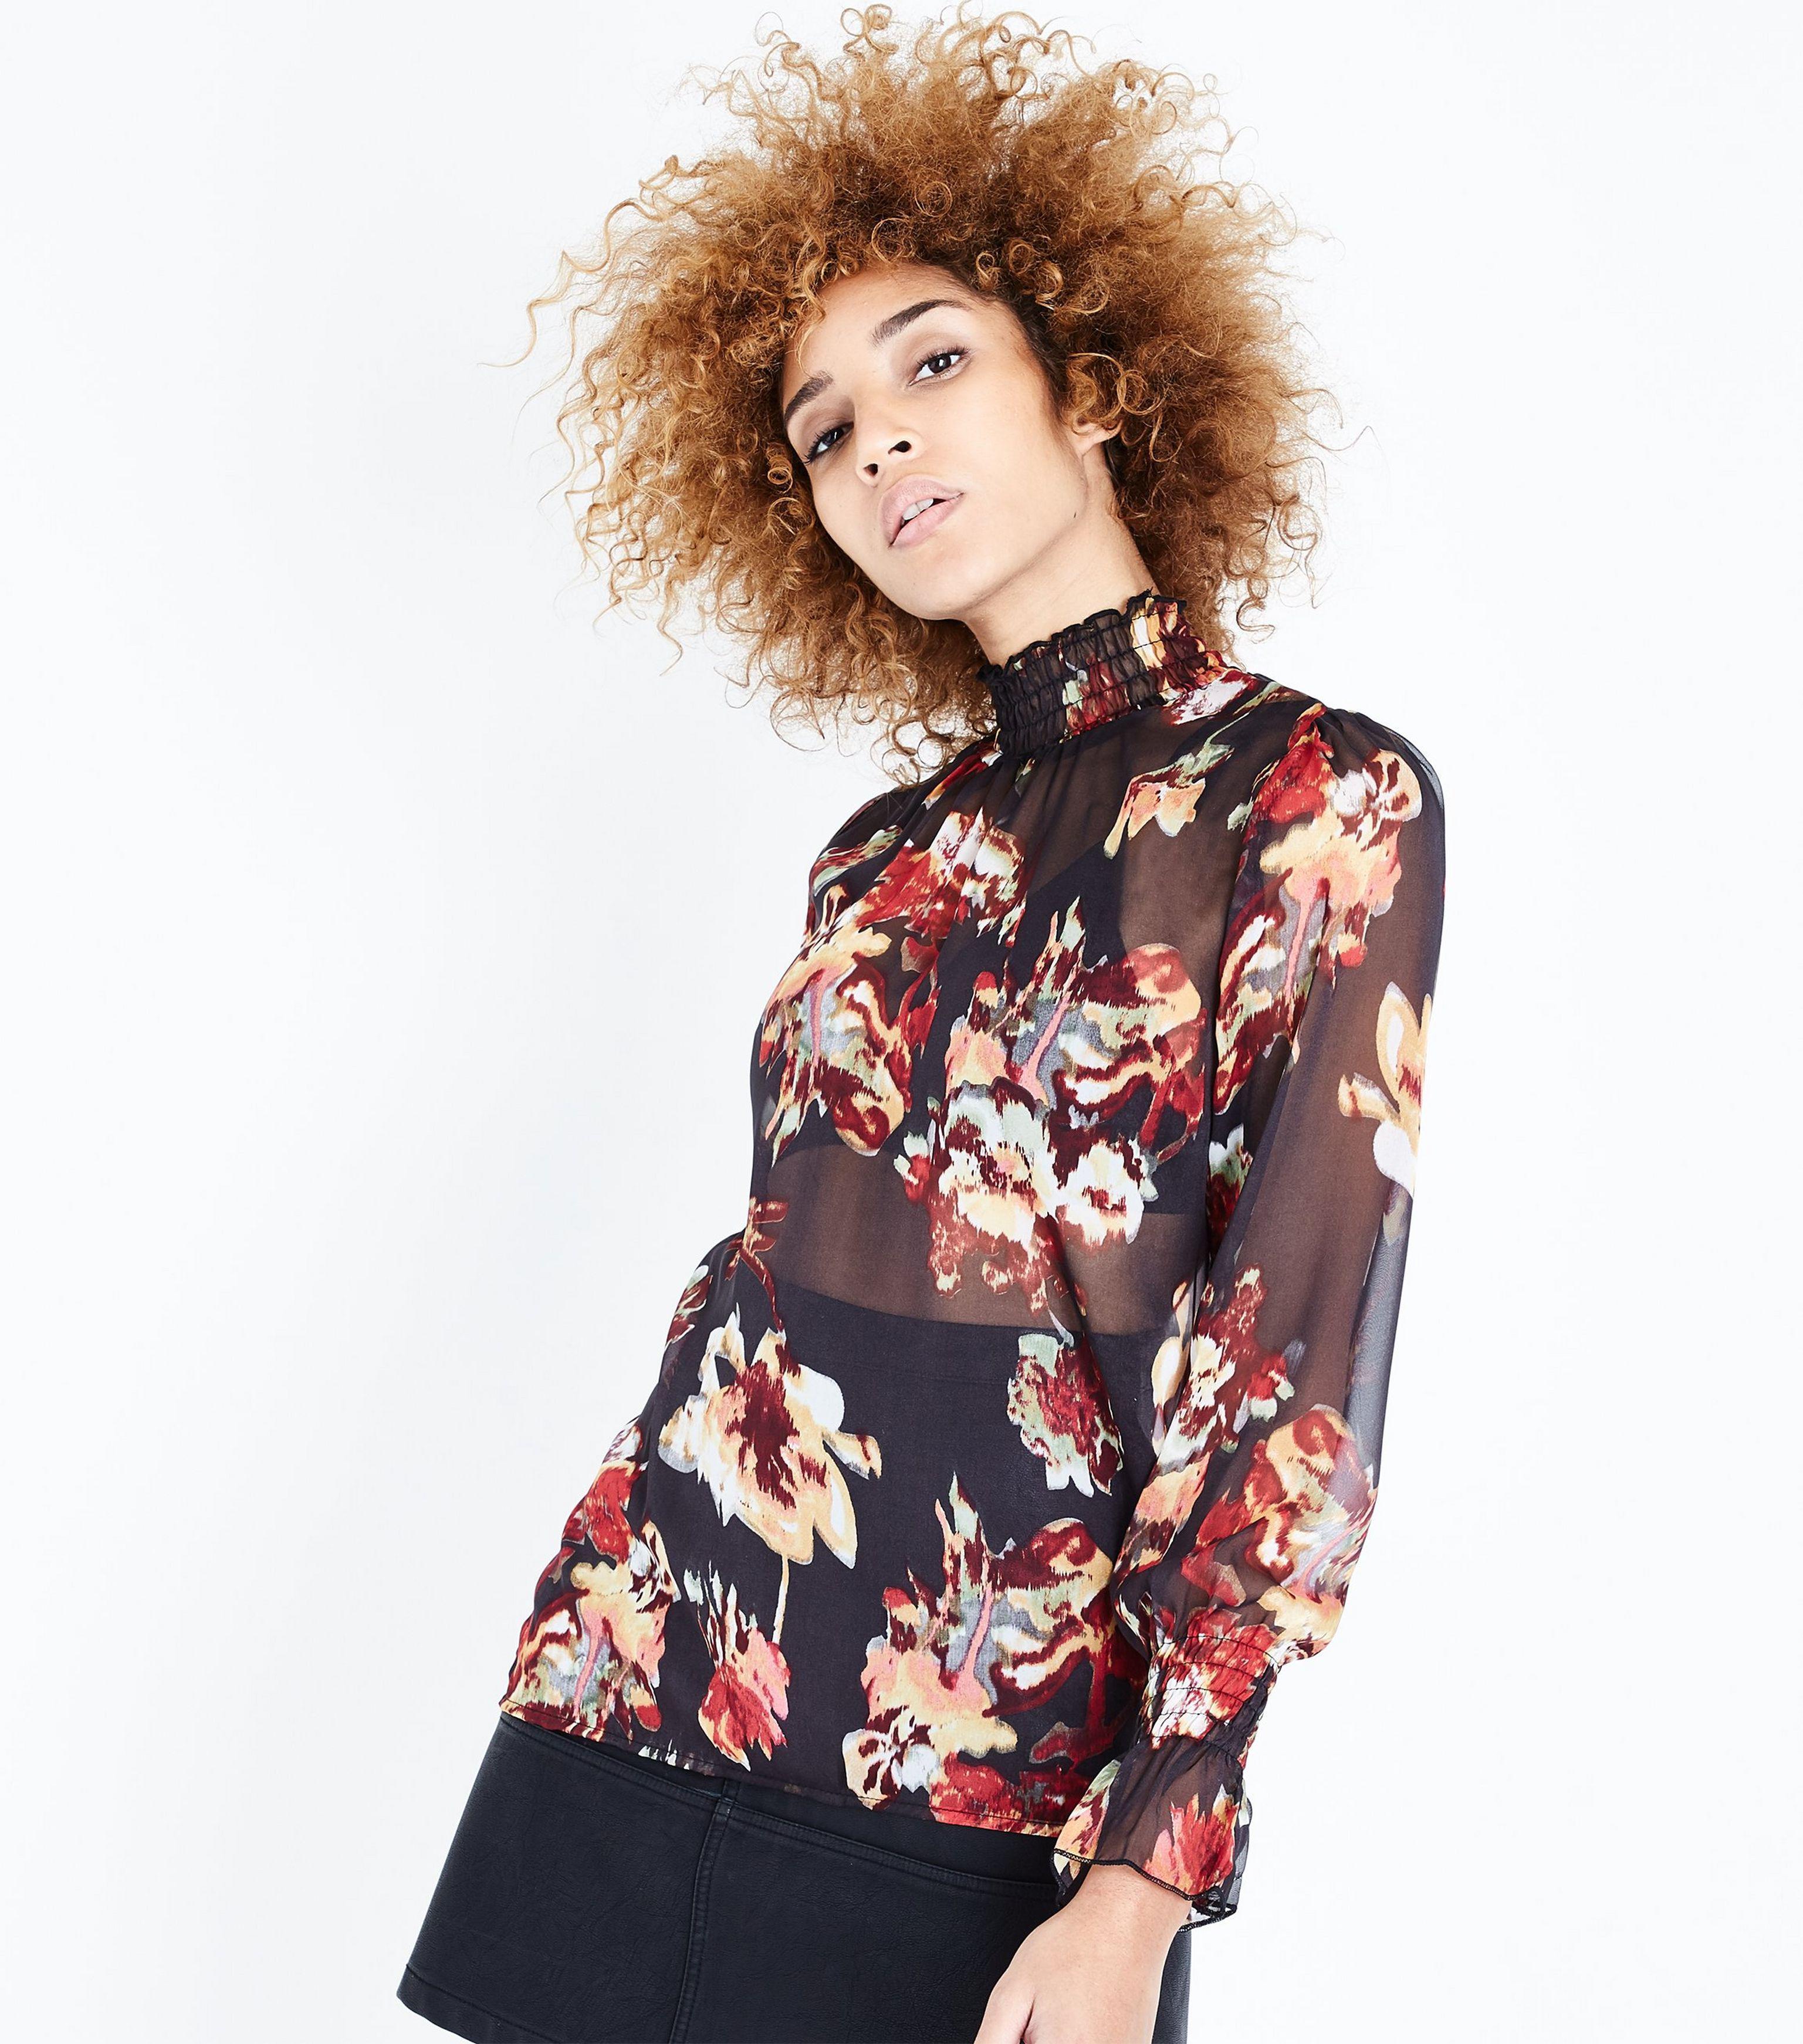 1a127311826e8 AX Paris Black Floral Print Chiffon Funnel Neck Top in Black - Lyst